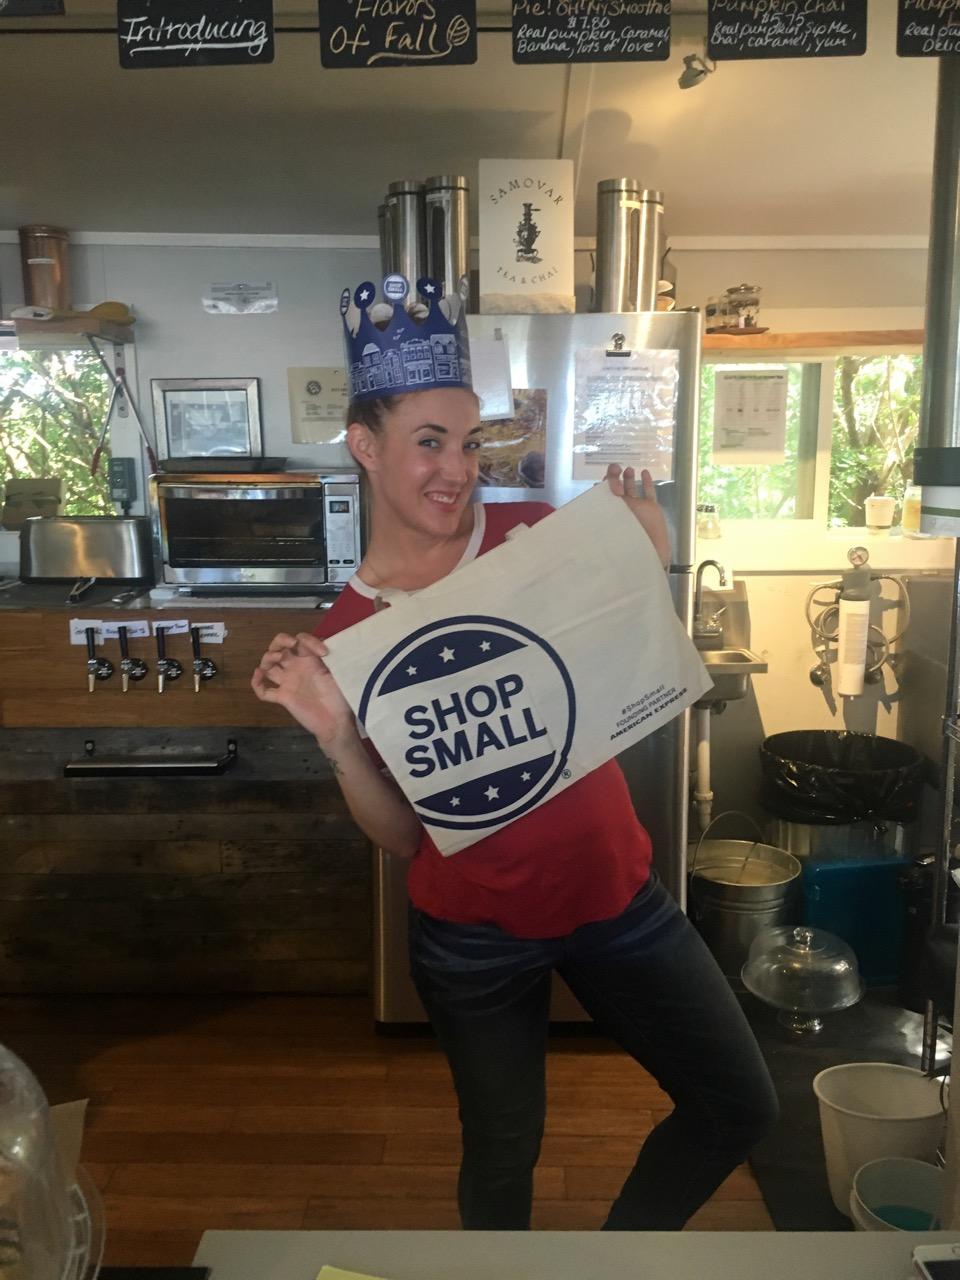 Sip Me owner, Laura Wentworth. Shop Small Saturday happens Nov. 26, 2016.